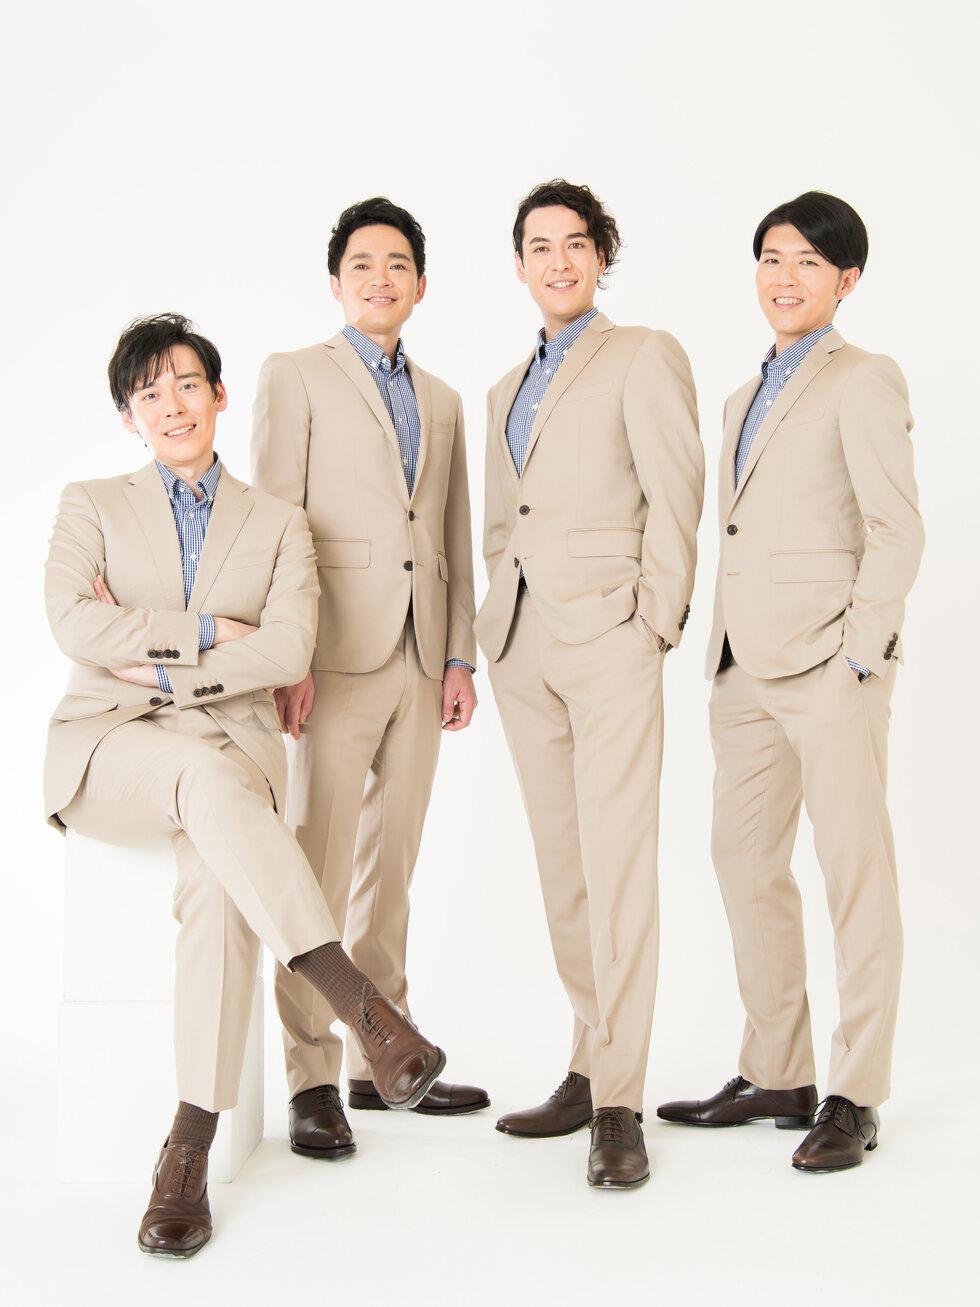 jammin'Zeb アカペラ+ONE 〜Vol.2〜【公演延期のお知らせ】8月3日15:00更新の写真